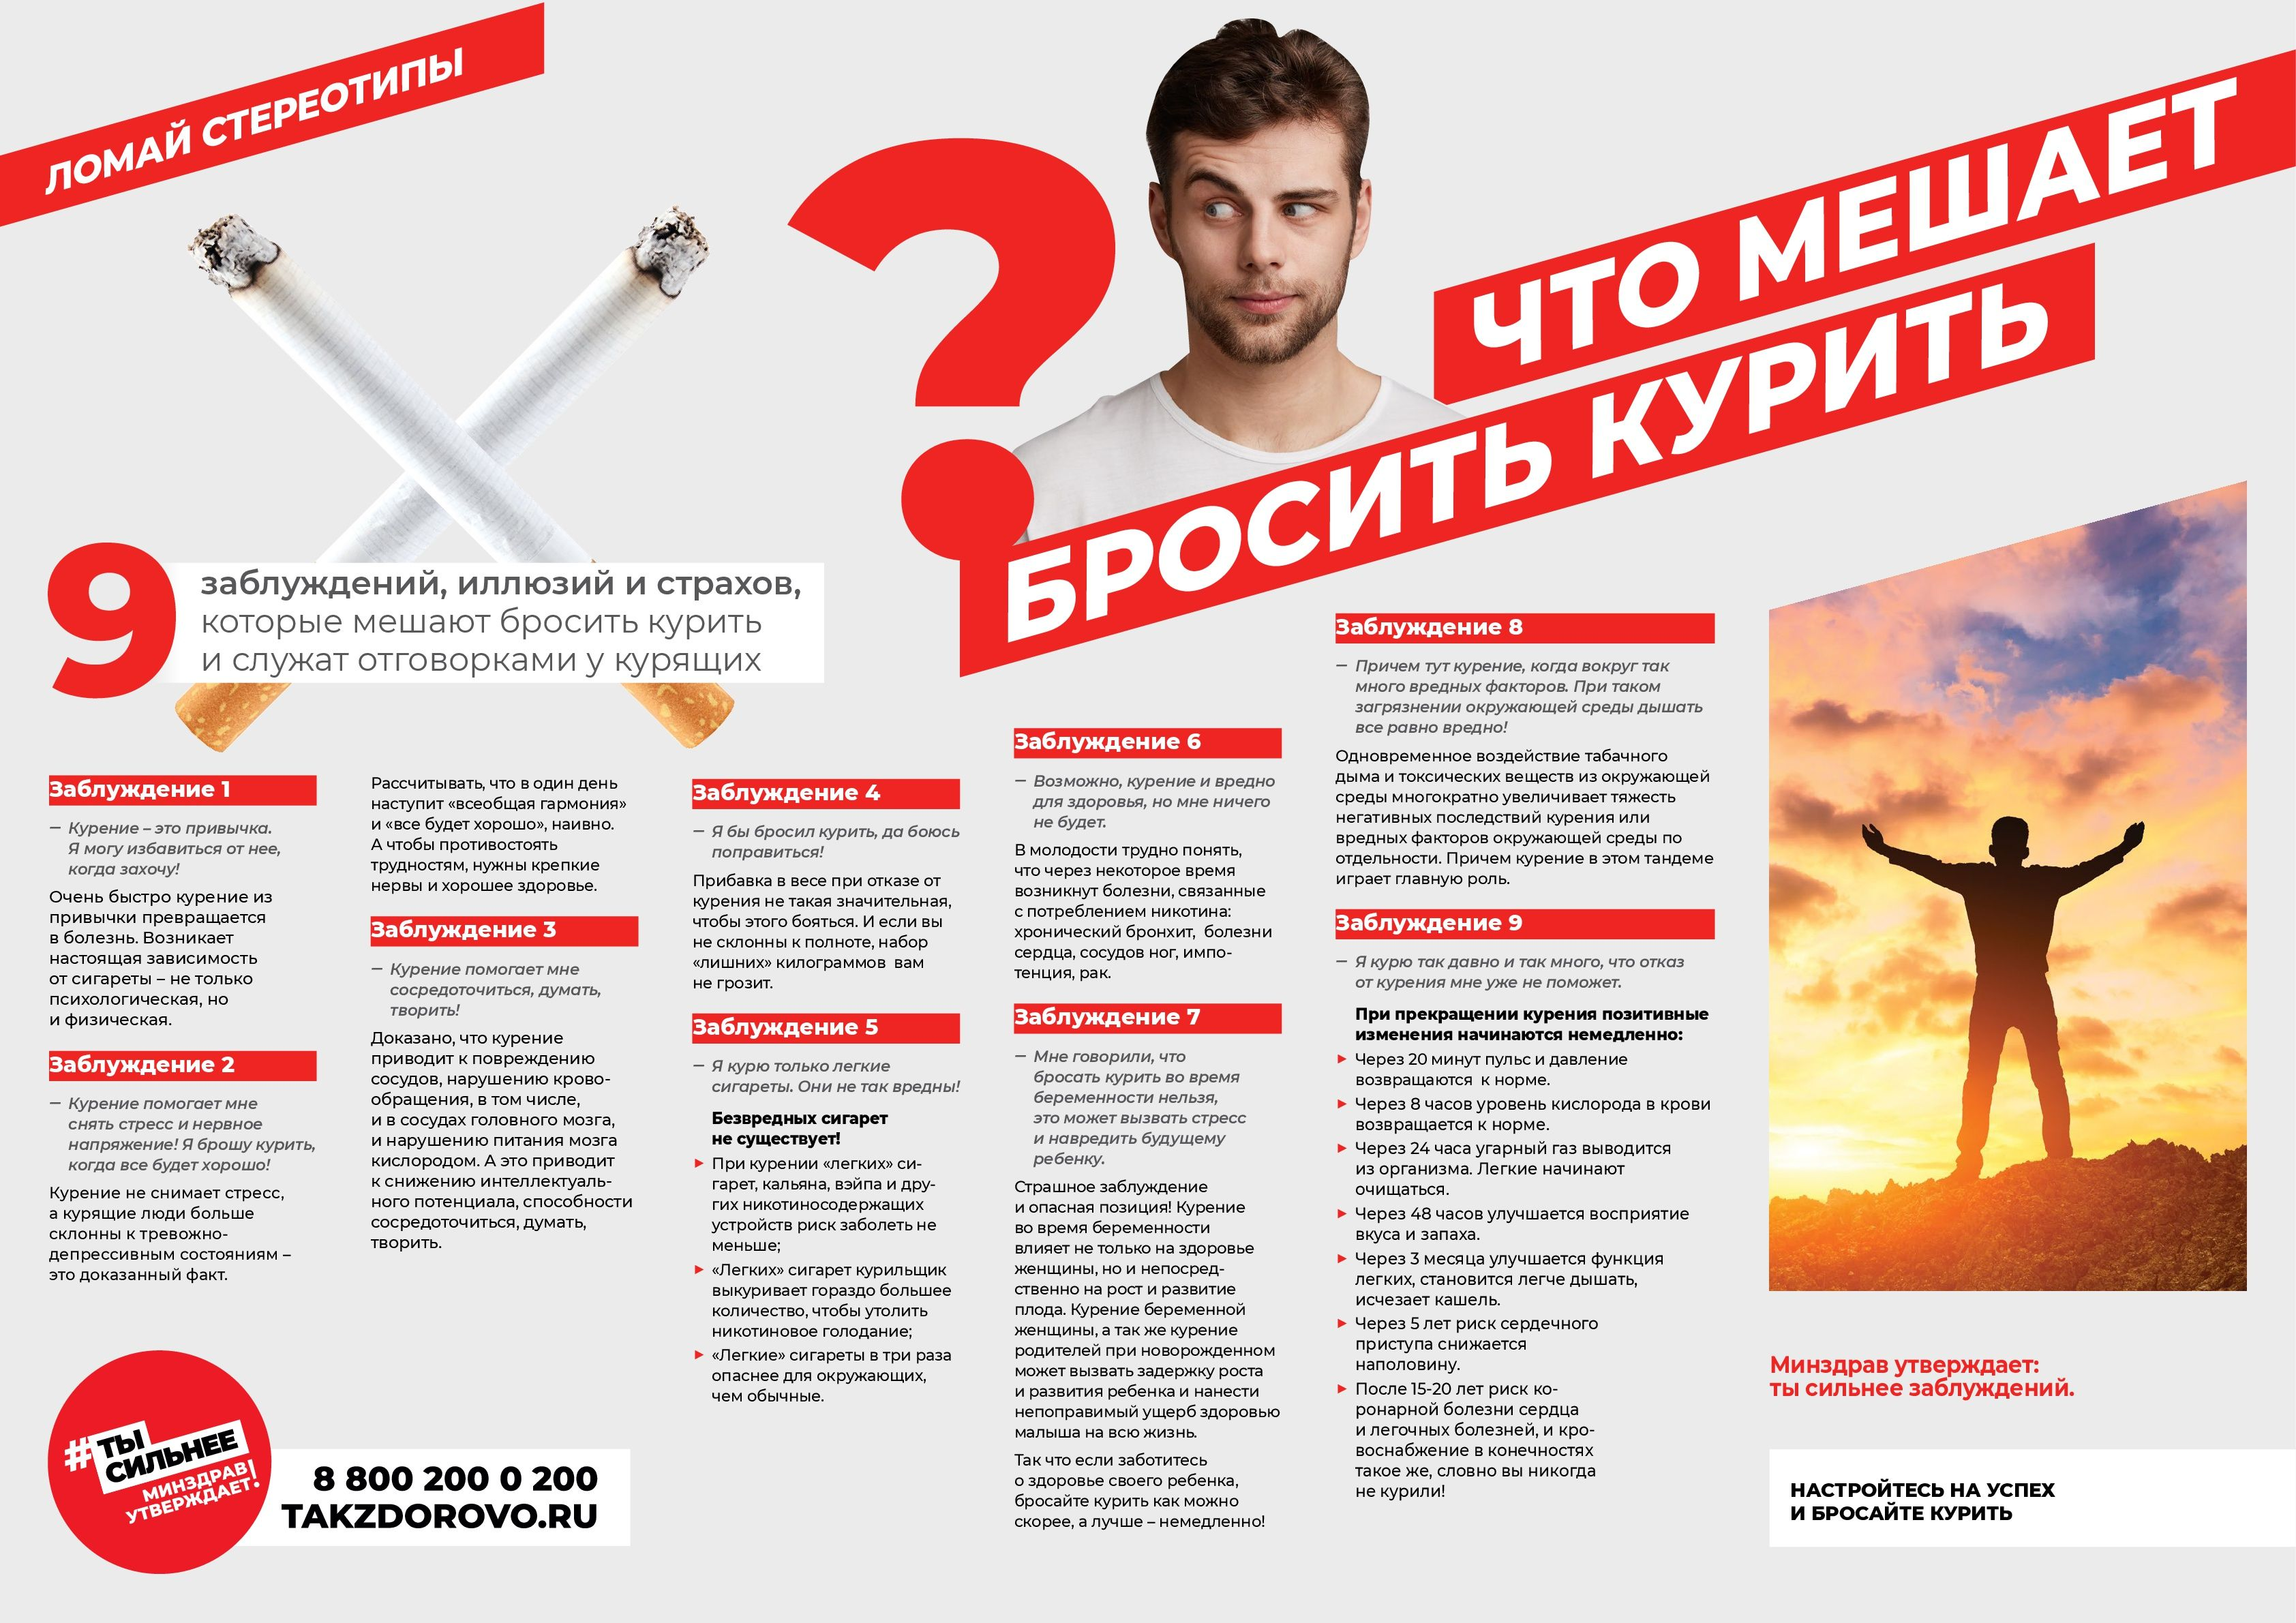 b_0_0_0_00_http___www.takzdorovo.ru_files_cd_9ab_cf90029405d56c12b193808b419_Minzdrav_poster_alko-001.jpg